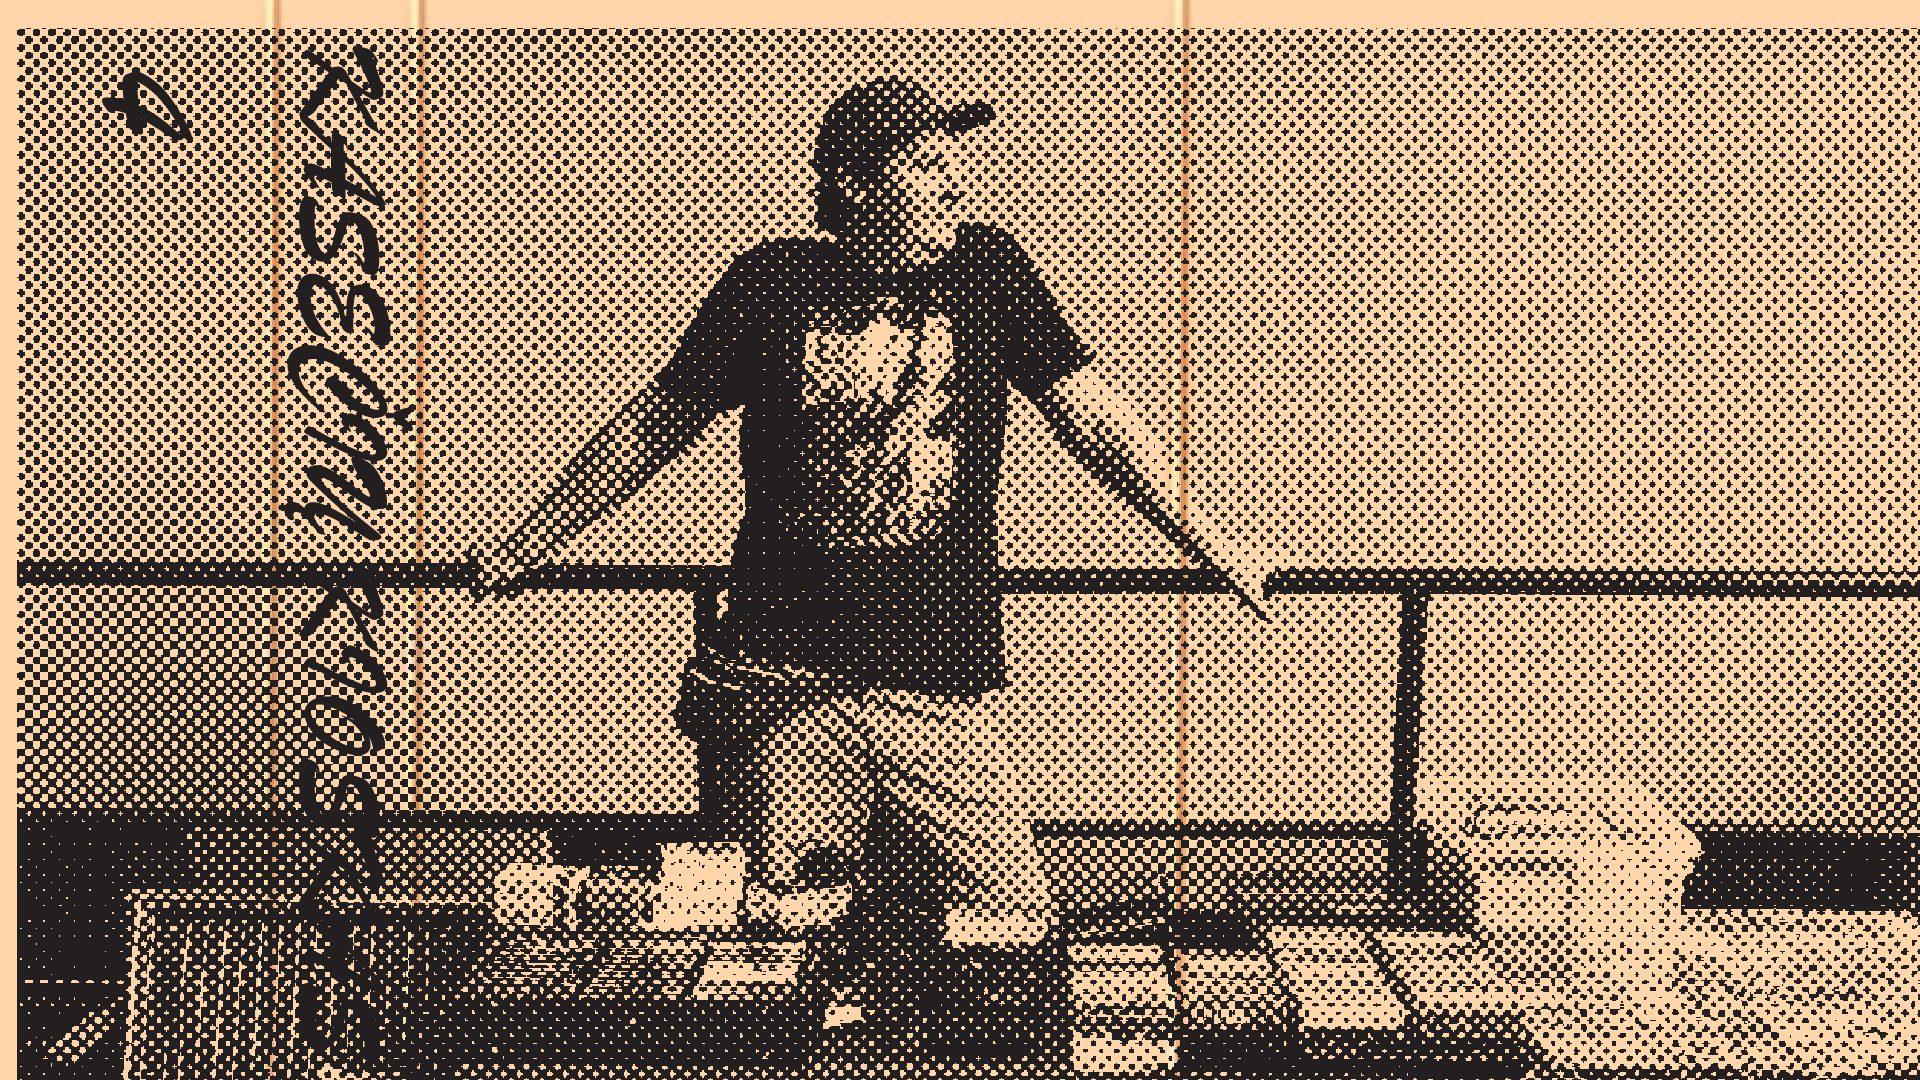 4th show. Lithuanian music that has been released on cassettes from the 90s to the present day. The show will feature: Giedrius Kuprevičius, Gintaras Sodeika, 'Ragis', 'Arno Apple', 'Echidna aukštyn', Viačeslavas Ganelinas, Pijus Džiugas Meižis, 'Without Letters', 'Ąžuoliniai berželiai' and Nervų sistemos tyrimų centro cassette.